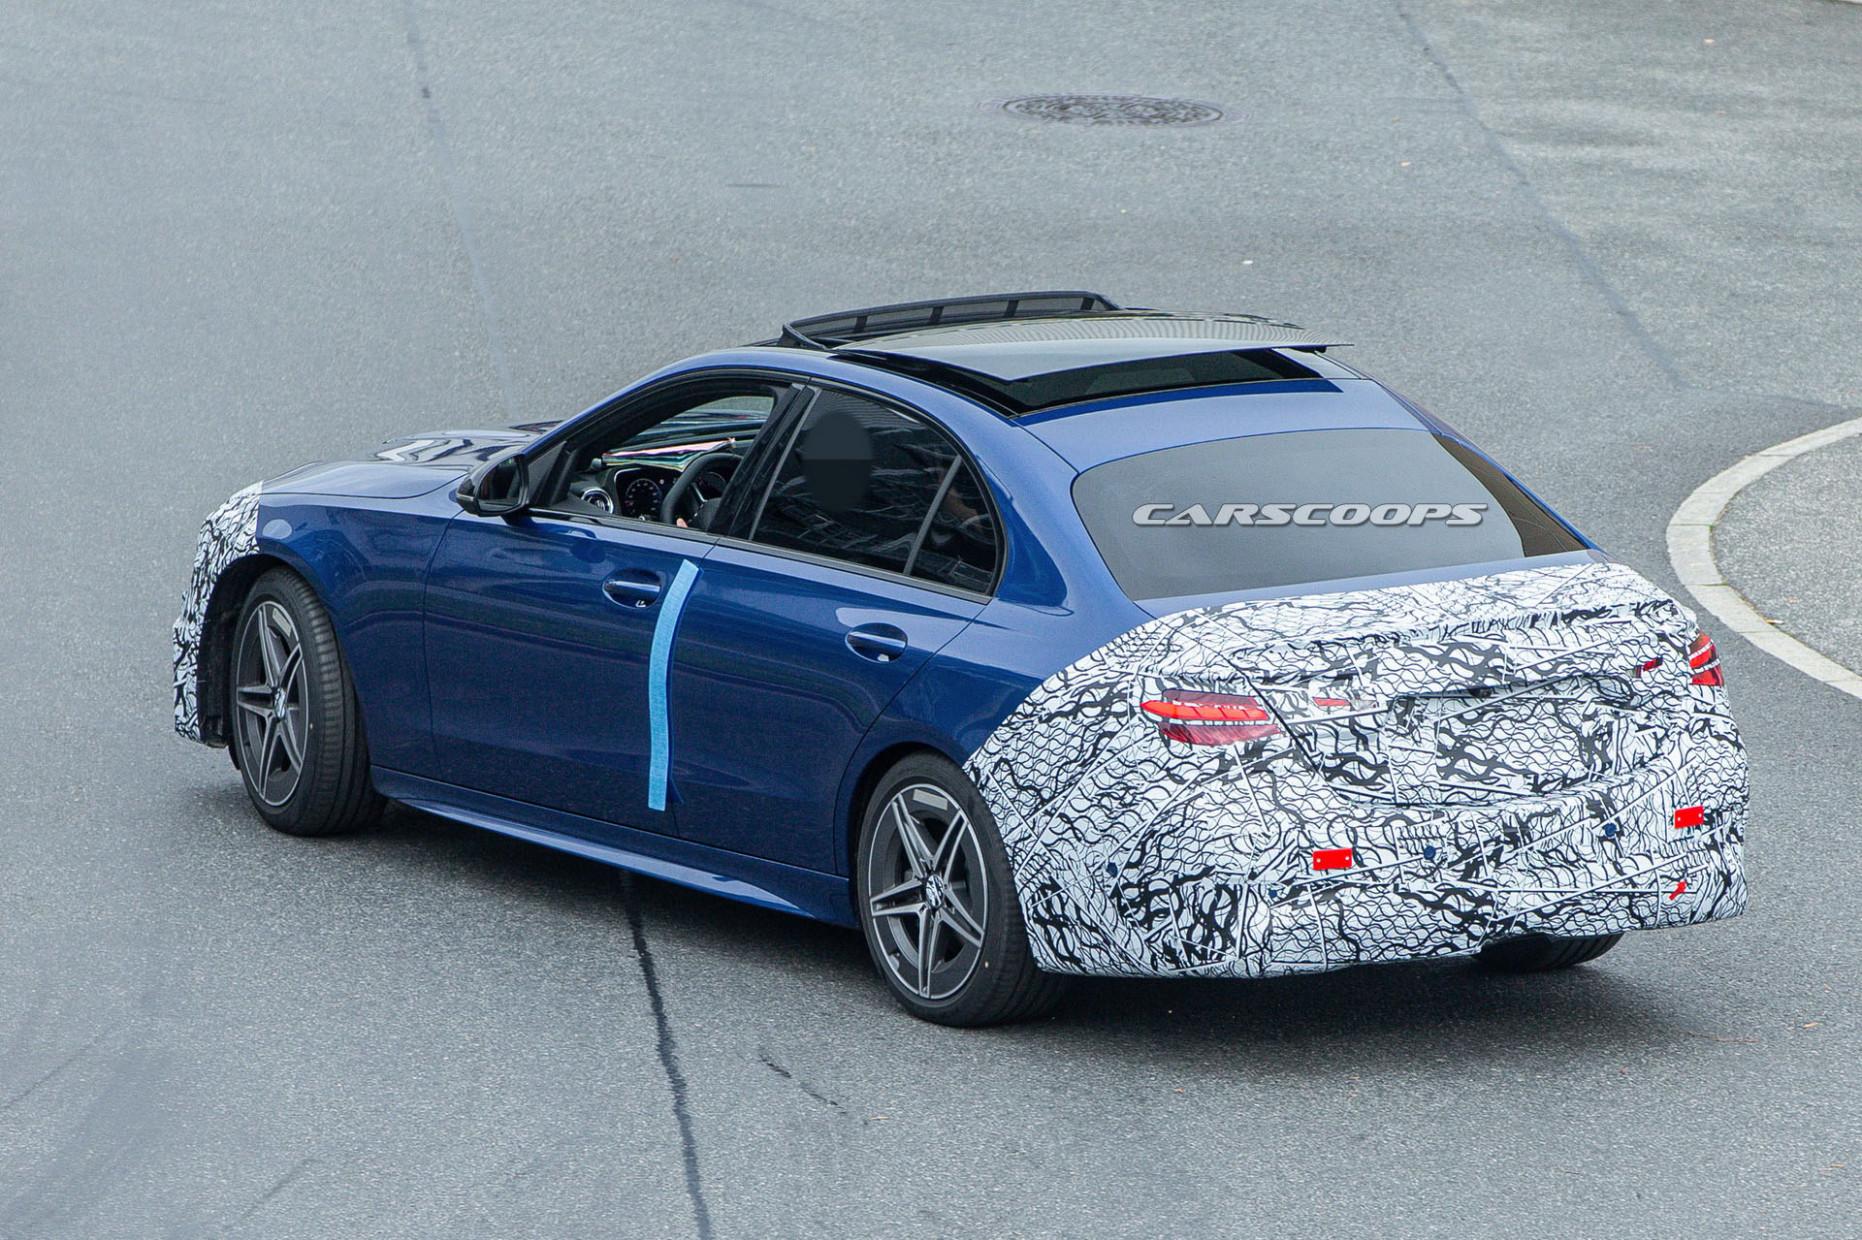 Style 2022 Mercedes C-class